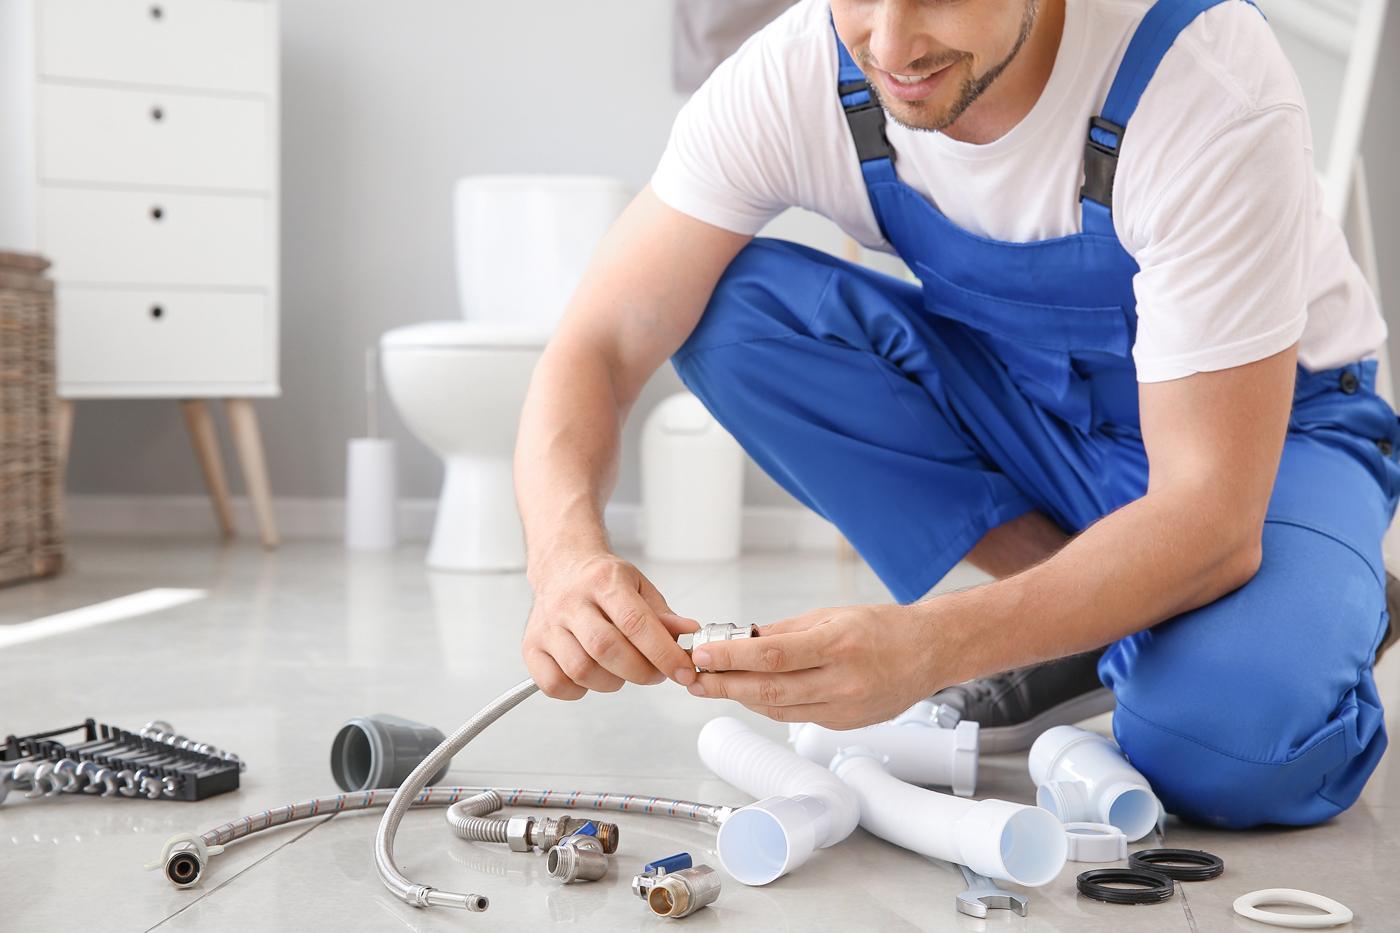 Plumbers 24x7: Emergency Plumbing Services - Plumbers near me